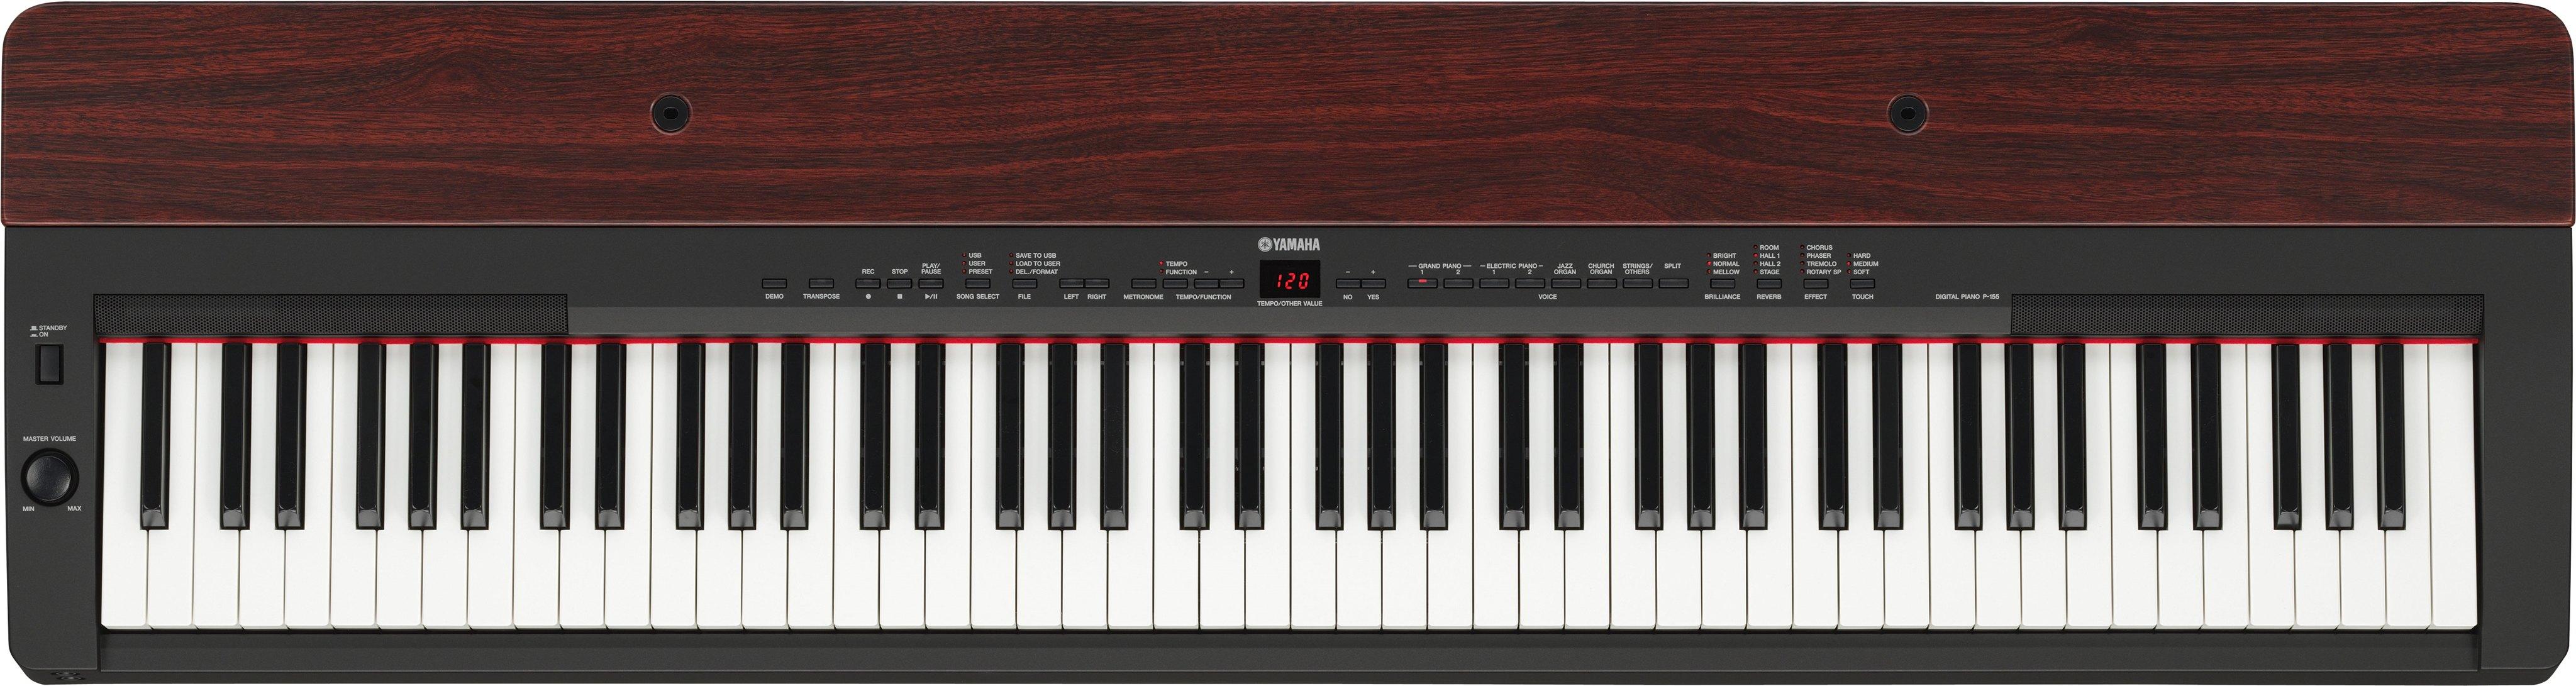 p 155 descripci n p series pianos instrumentos musicales productos yamaha espa a. Black Bedroom Furniture Sets. Home Design Ideas